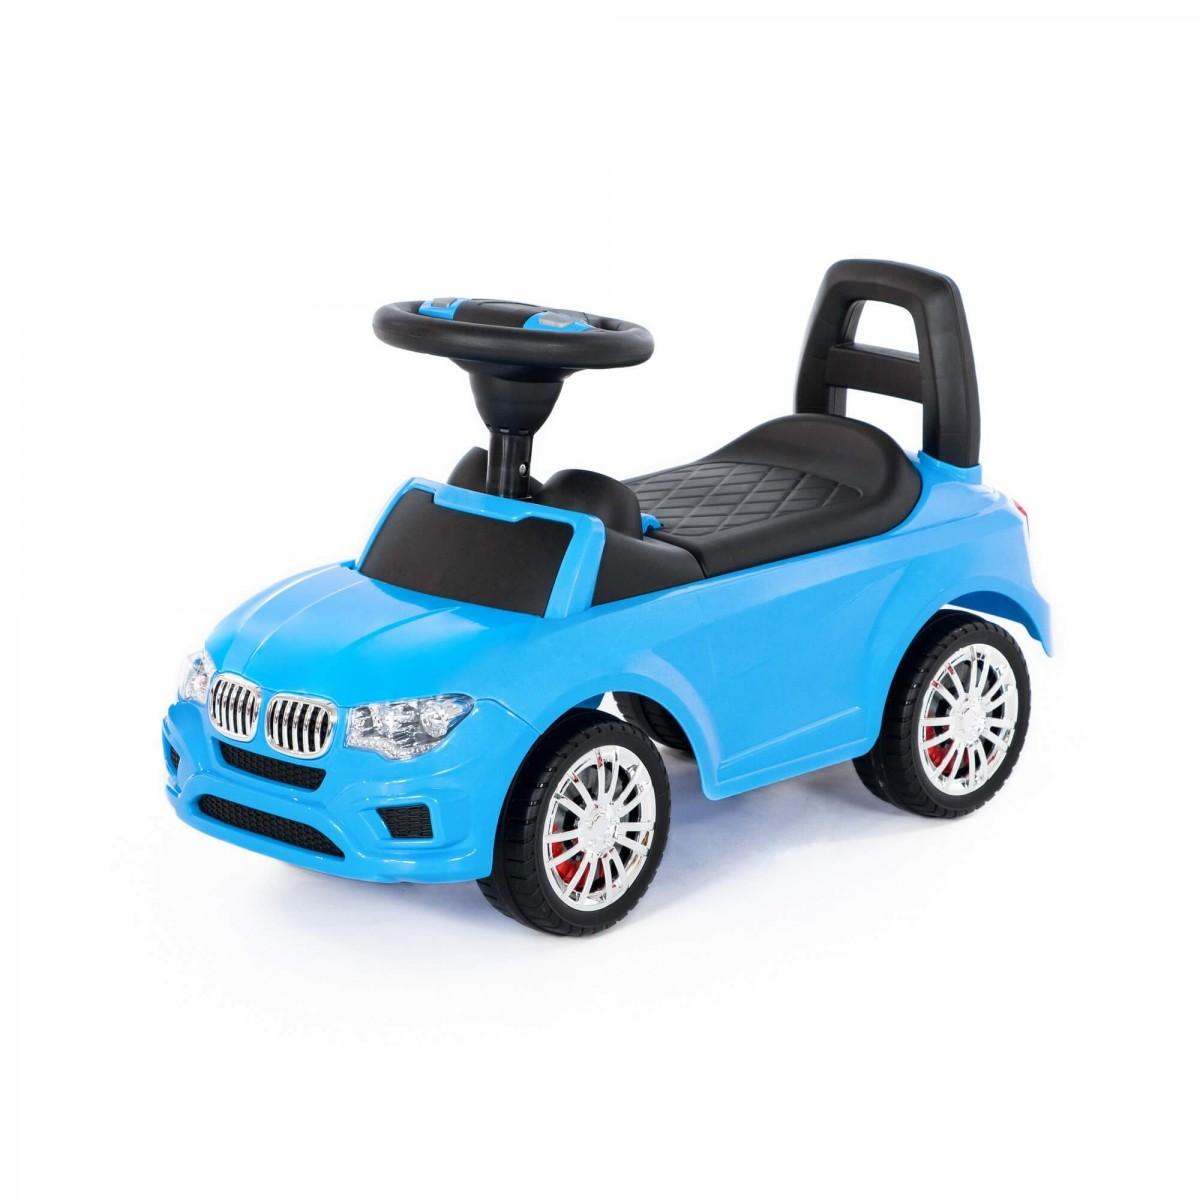 Detské odrážadlo SuperCar Race modré